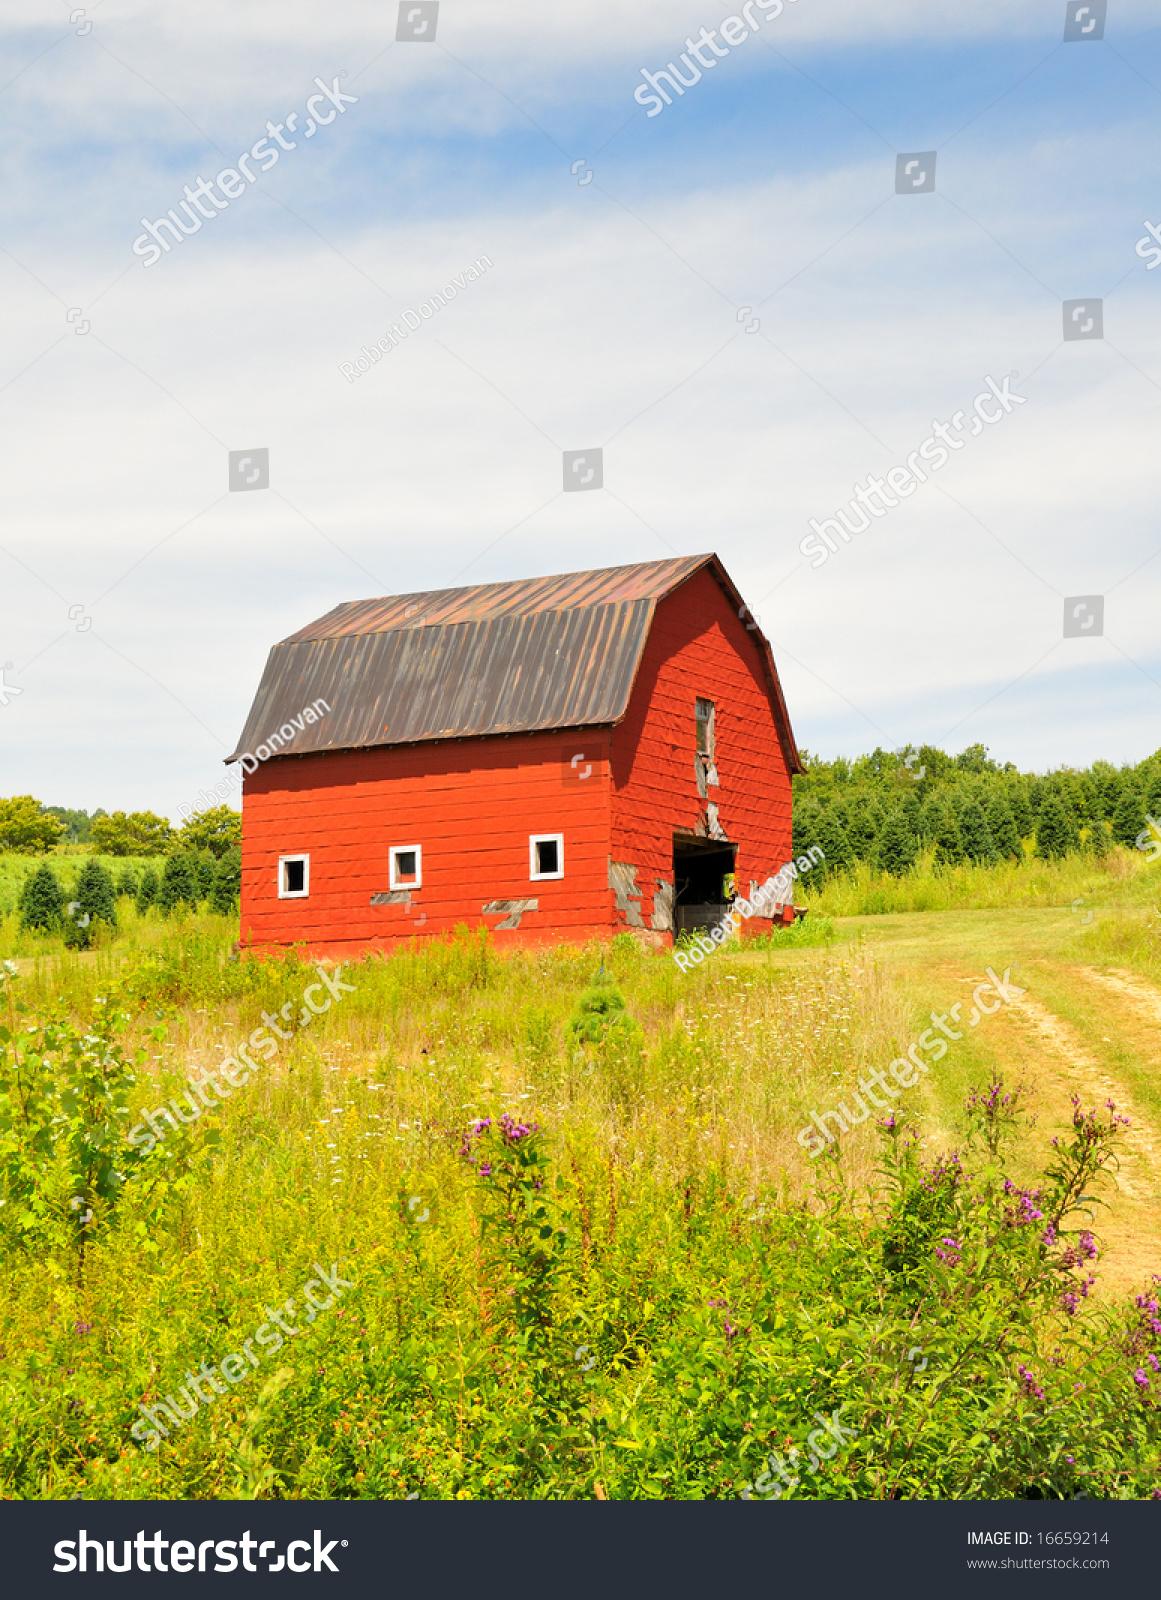 Old Red Barn Christmas Tree Farm Stock Photo (Edit Now) 16659214 ...